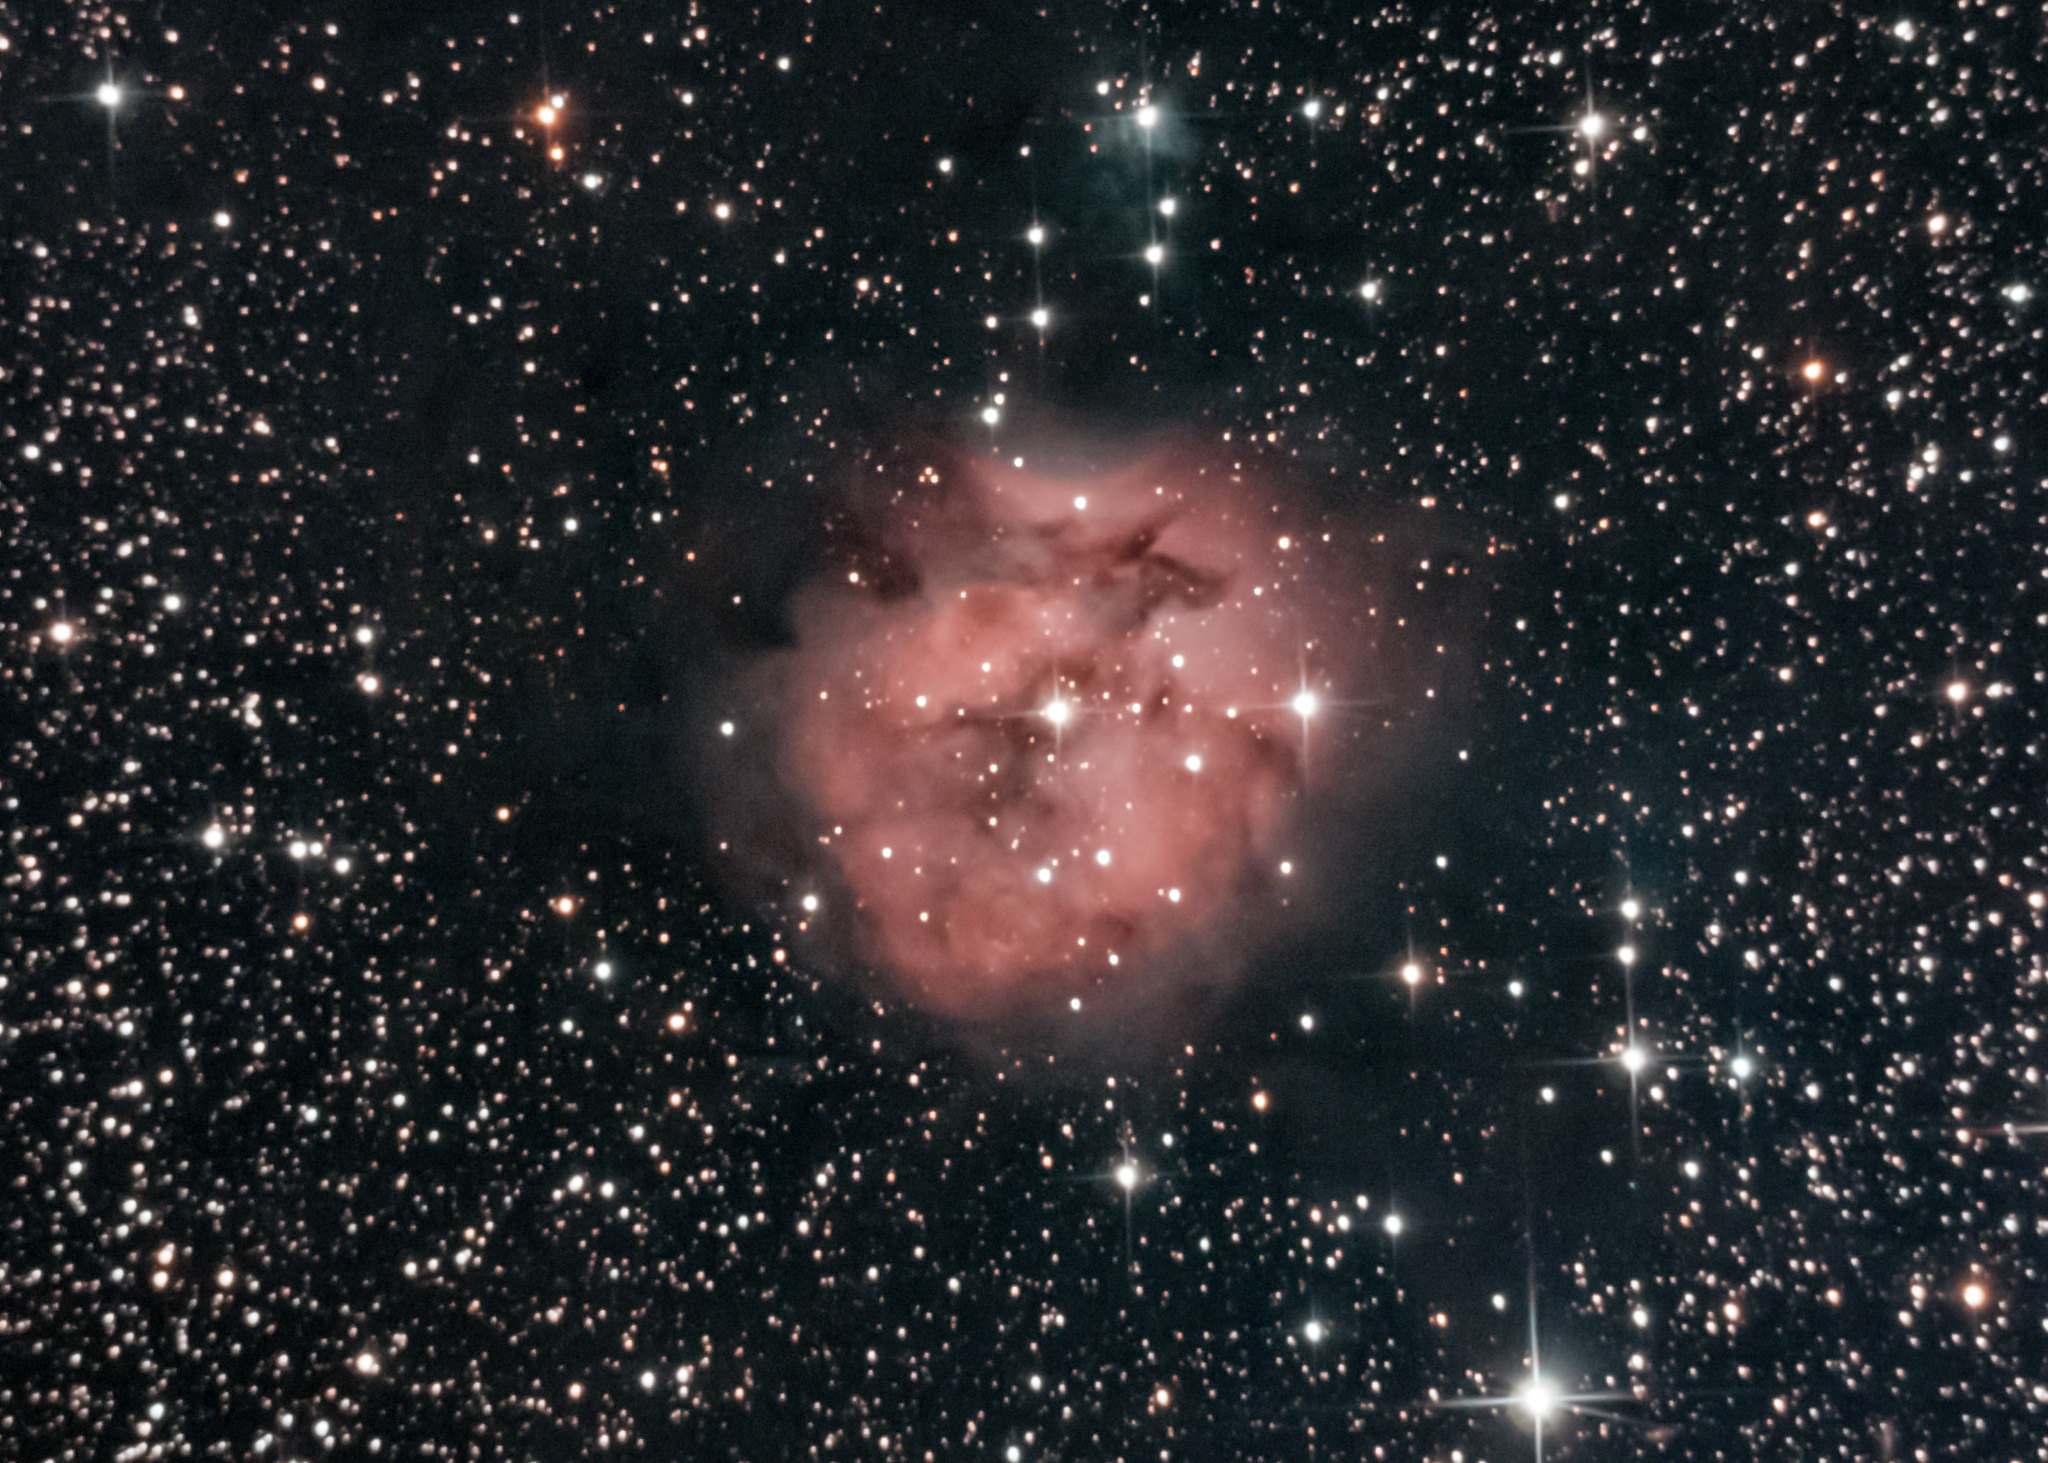 Cocoon Nebula by Ian Smith